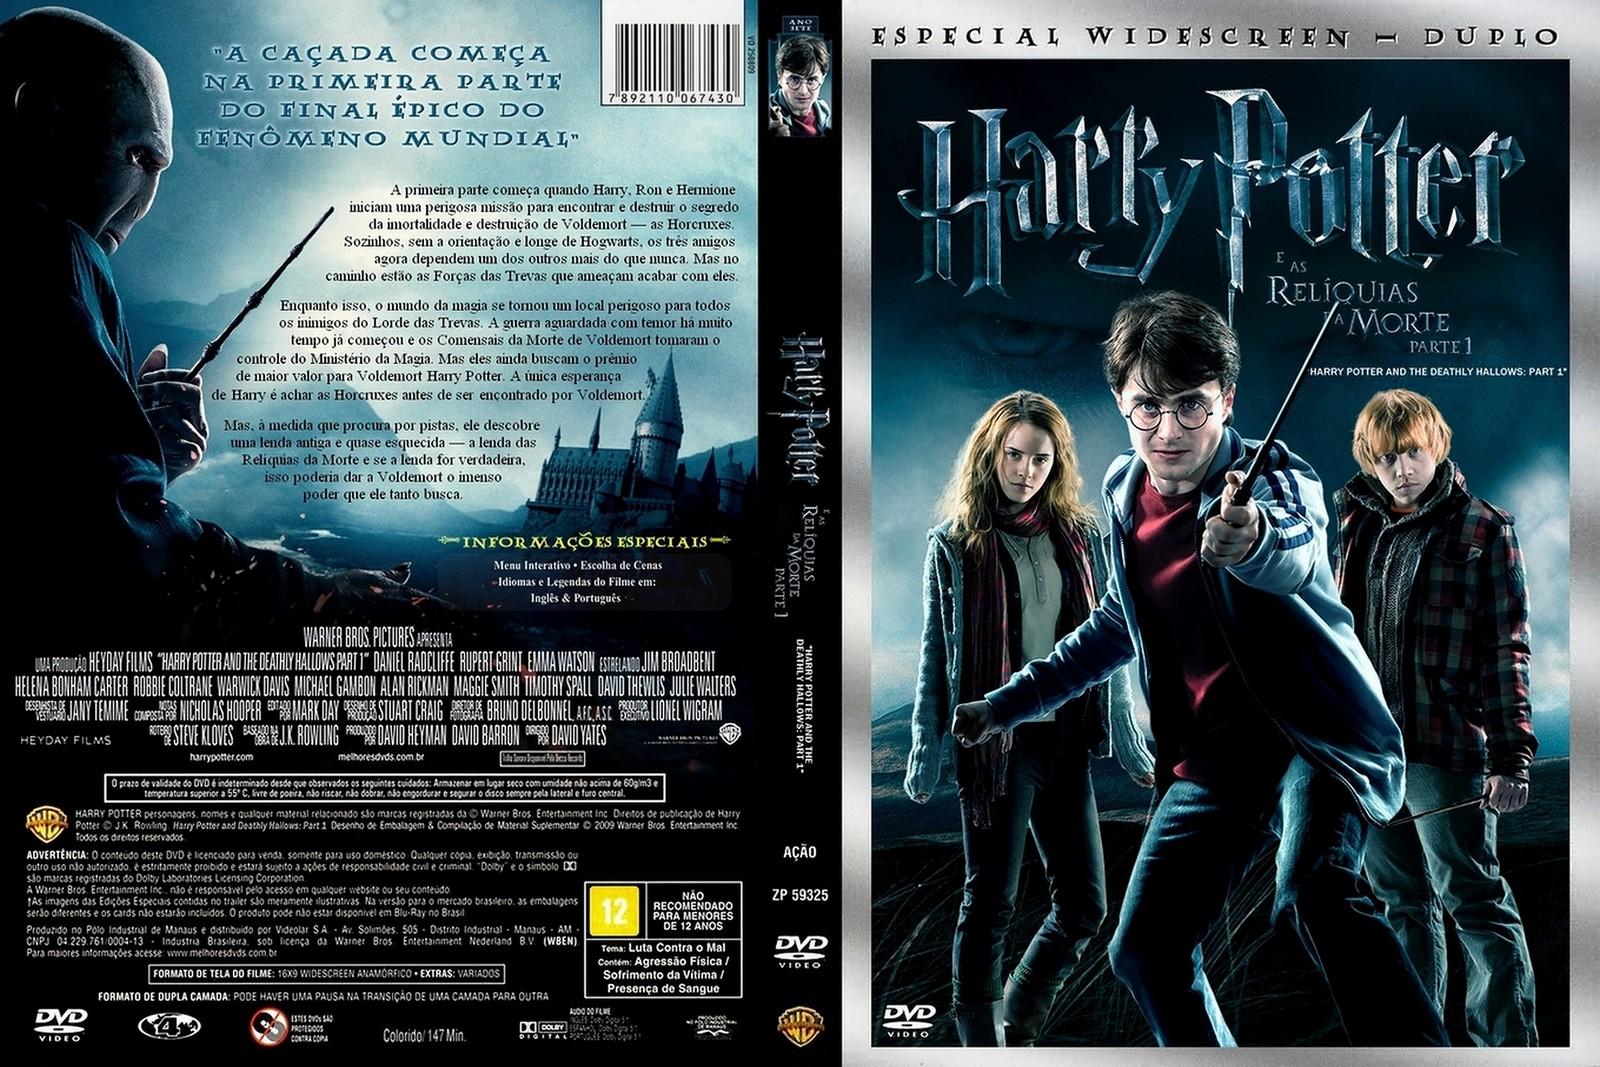 http://4.bp.blogspot.com/-lcp1Xf8VTTg/TZ8wvIo-FYI/AAAAAAAAD_s/RnTDY_-_WT8/s1600/Harry-Potter-E-As-Reliquias-Da-Morte-Parte-1-custom.jpg